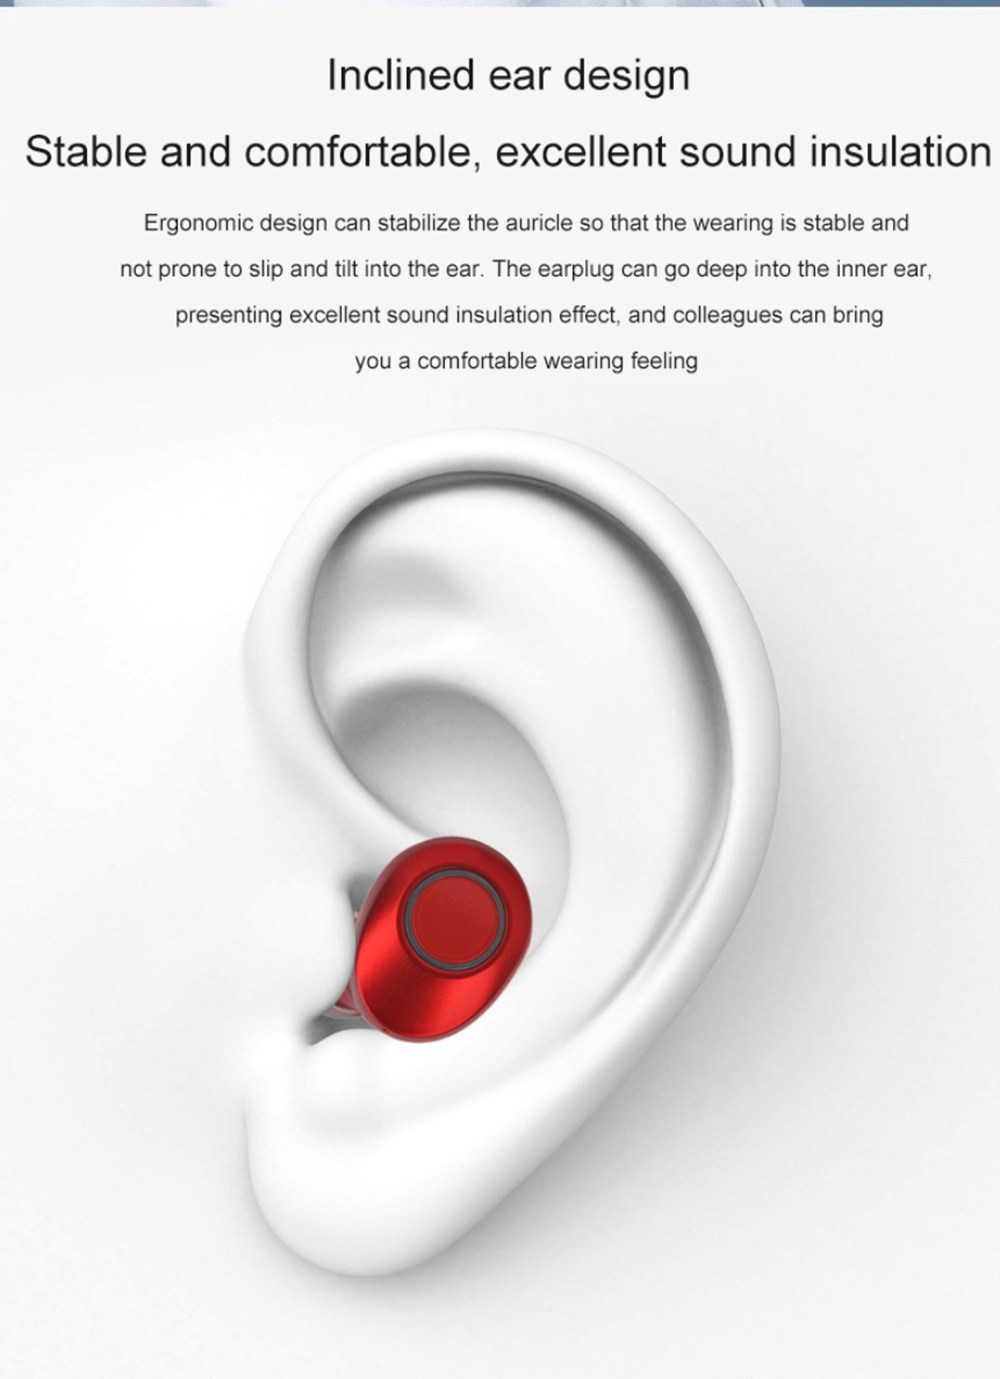 J29 Bluetooth 5.0 TWS Earbuds Siri Used Independently Noise Reduction Volume Adjustment - Black